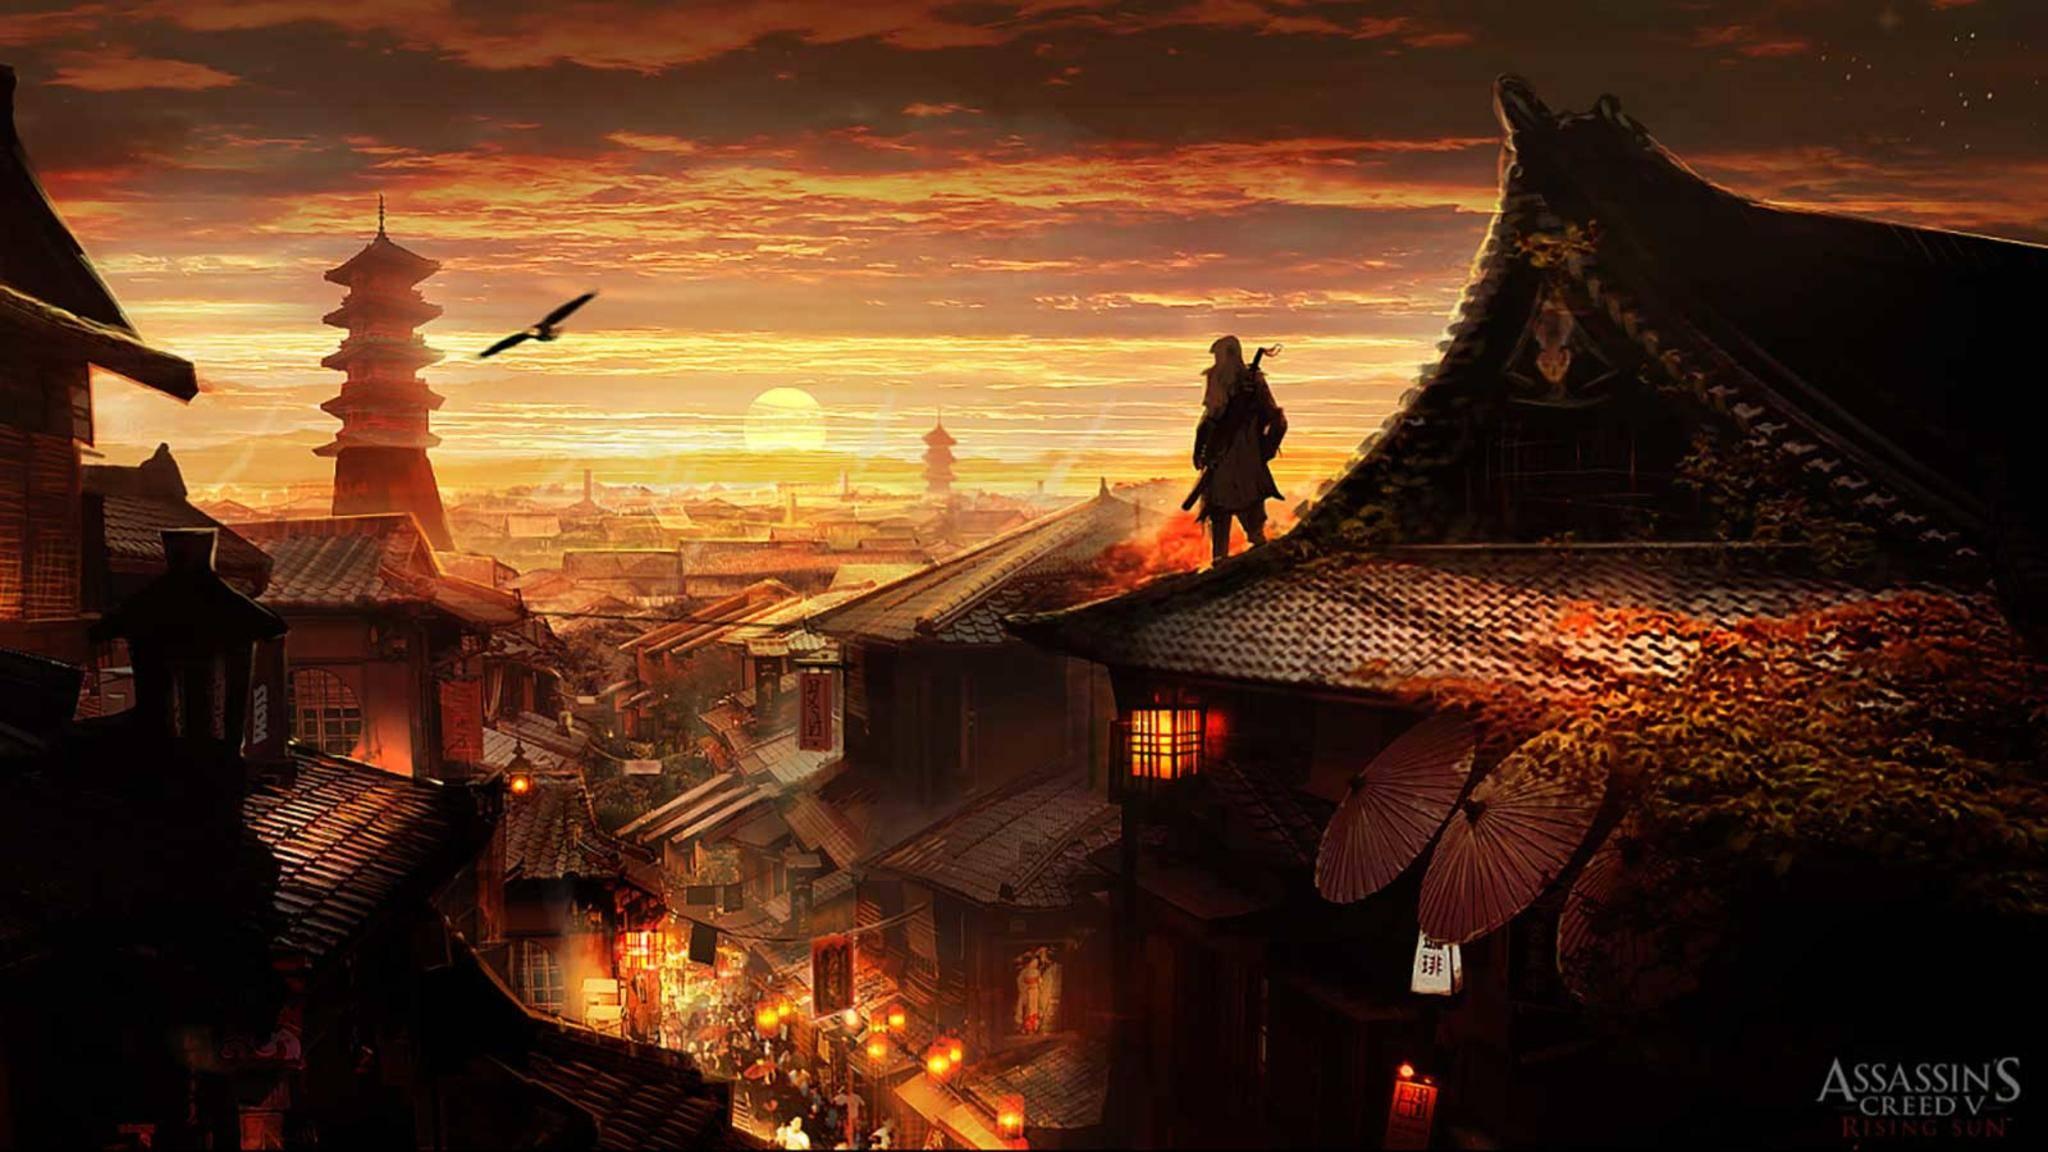 Assassin's Creed: Rising Sun